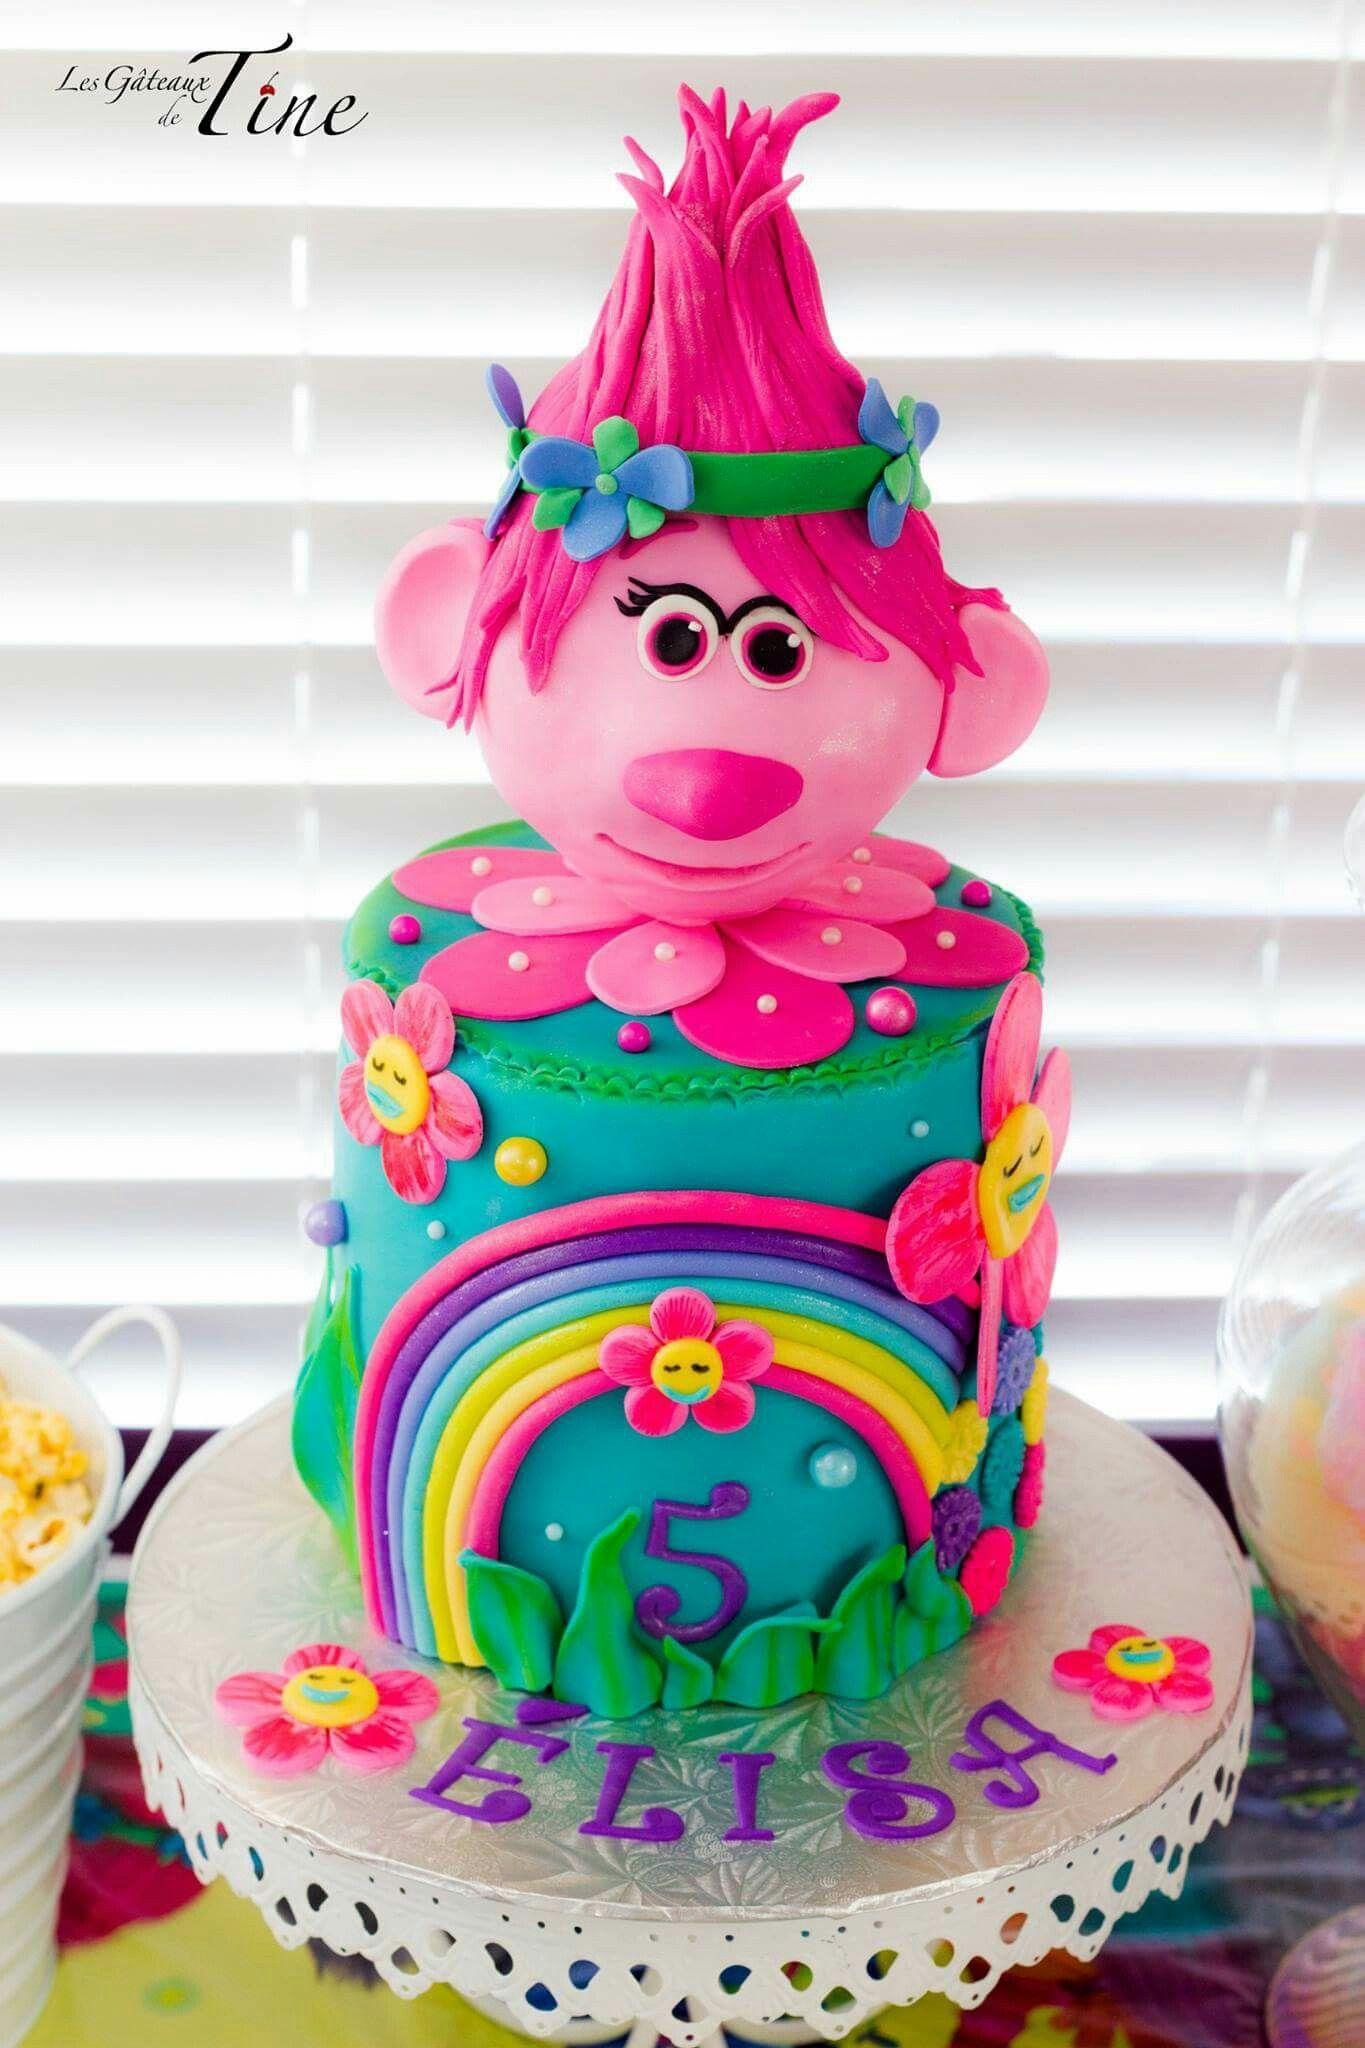 Cake Design Trolls : Trolls Cake Trolls Party Pinterest Cake, Troll party ...